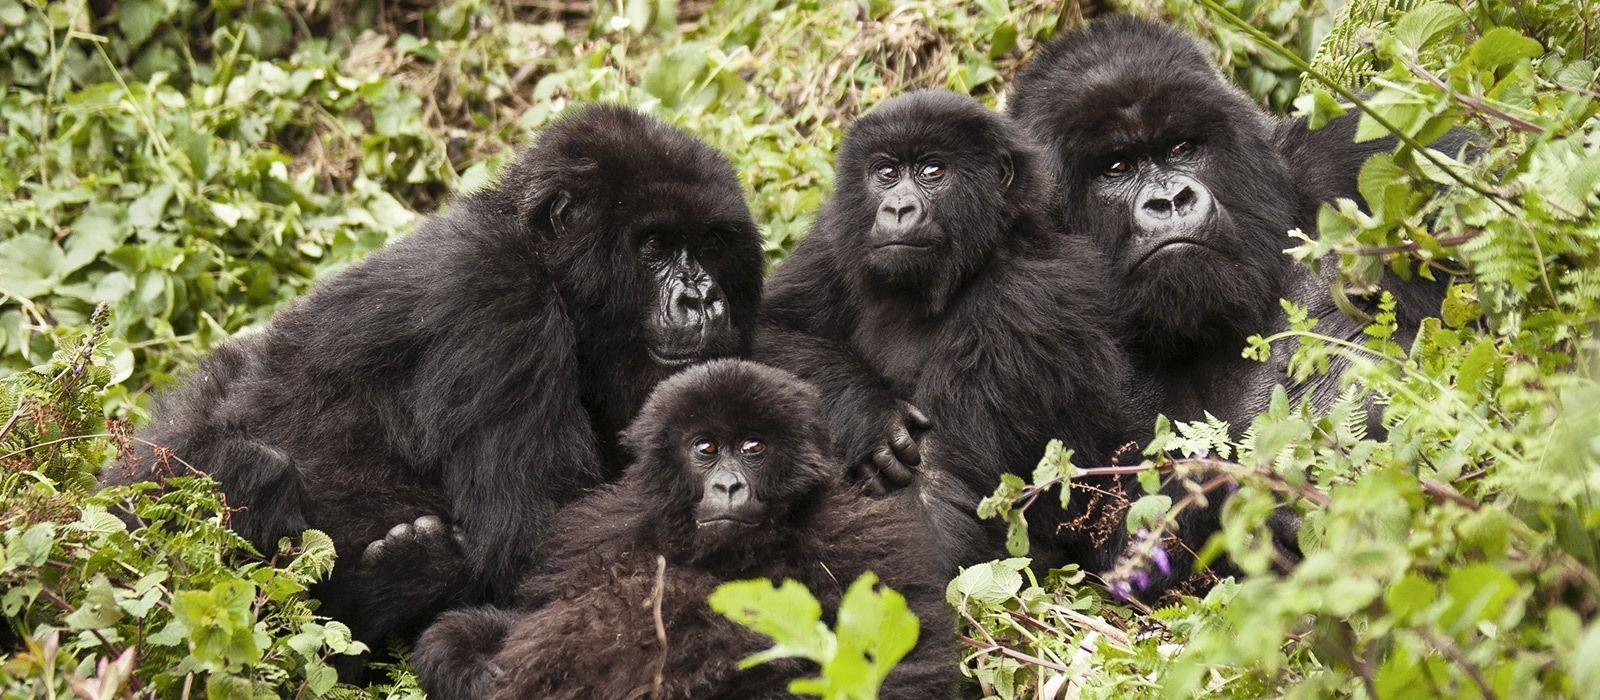 Kenia & Ruanda: Herzklopfen beim Gorilla Tracking Urlaub 5